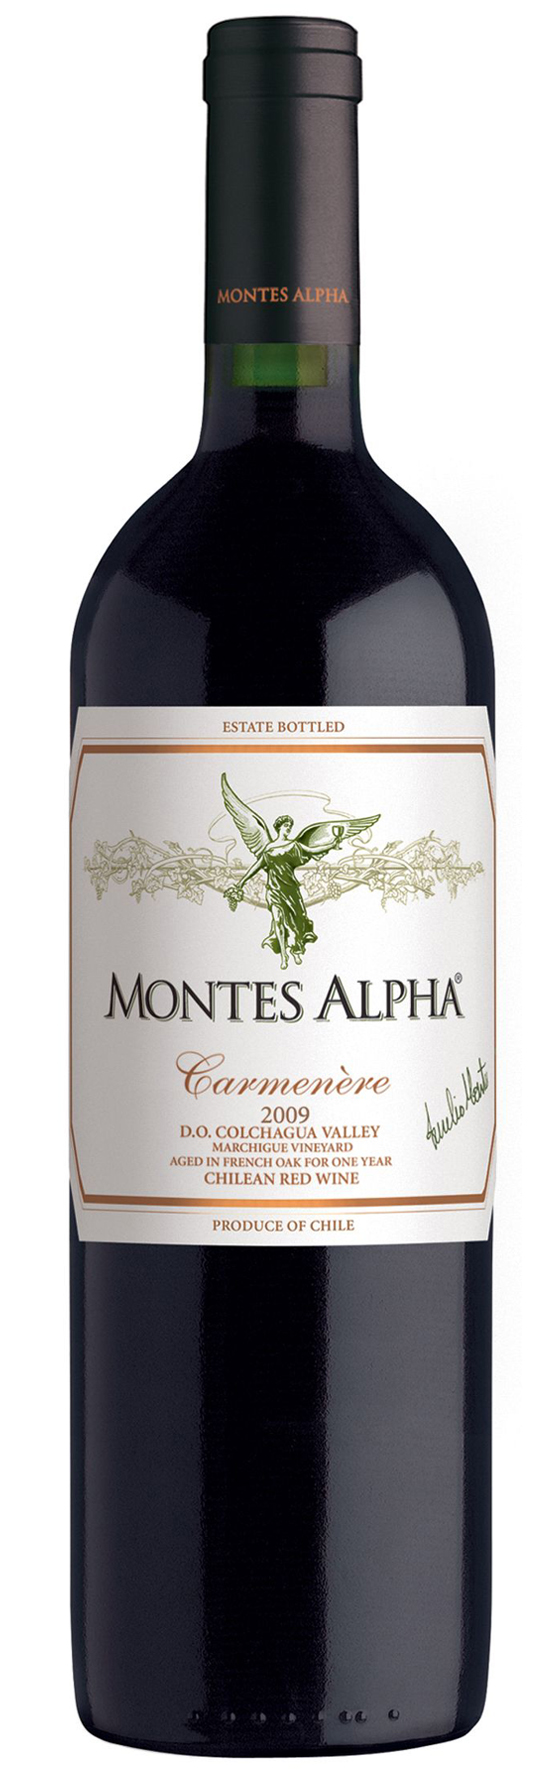 Montes Alpha Carmenere 2014 Montes Chile Valle Central